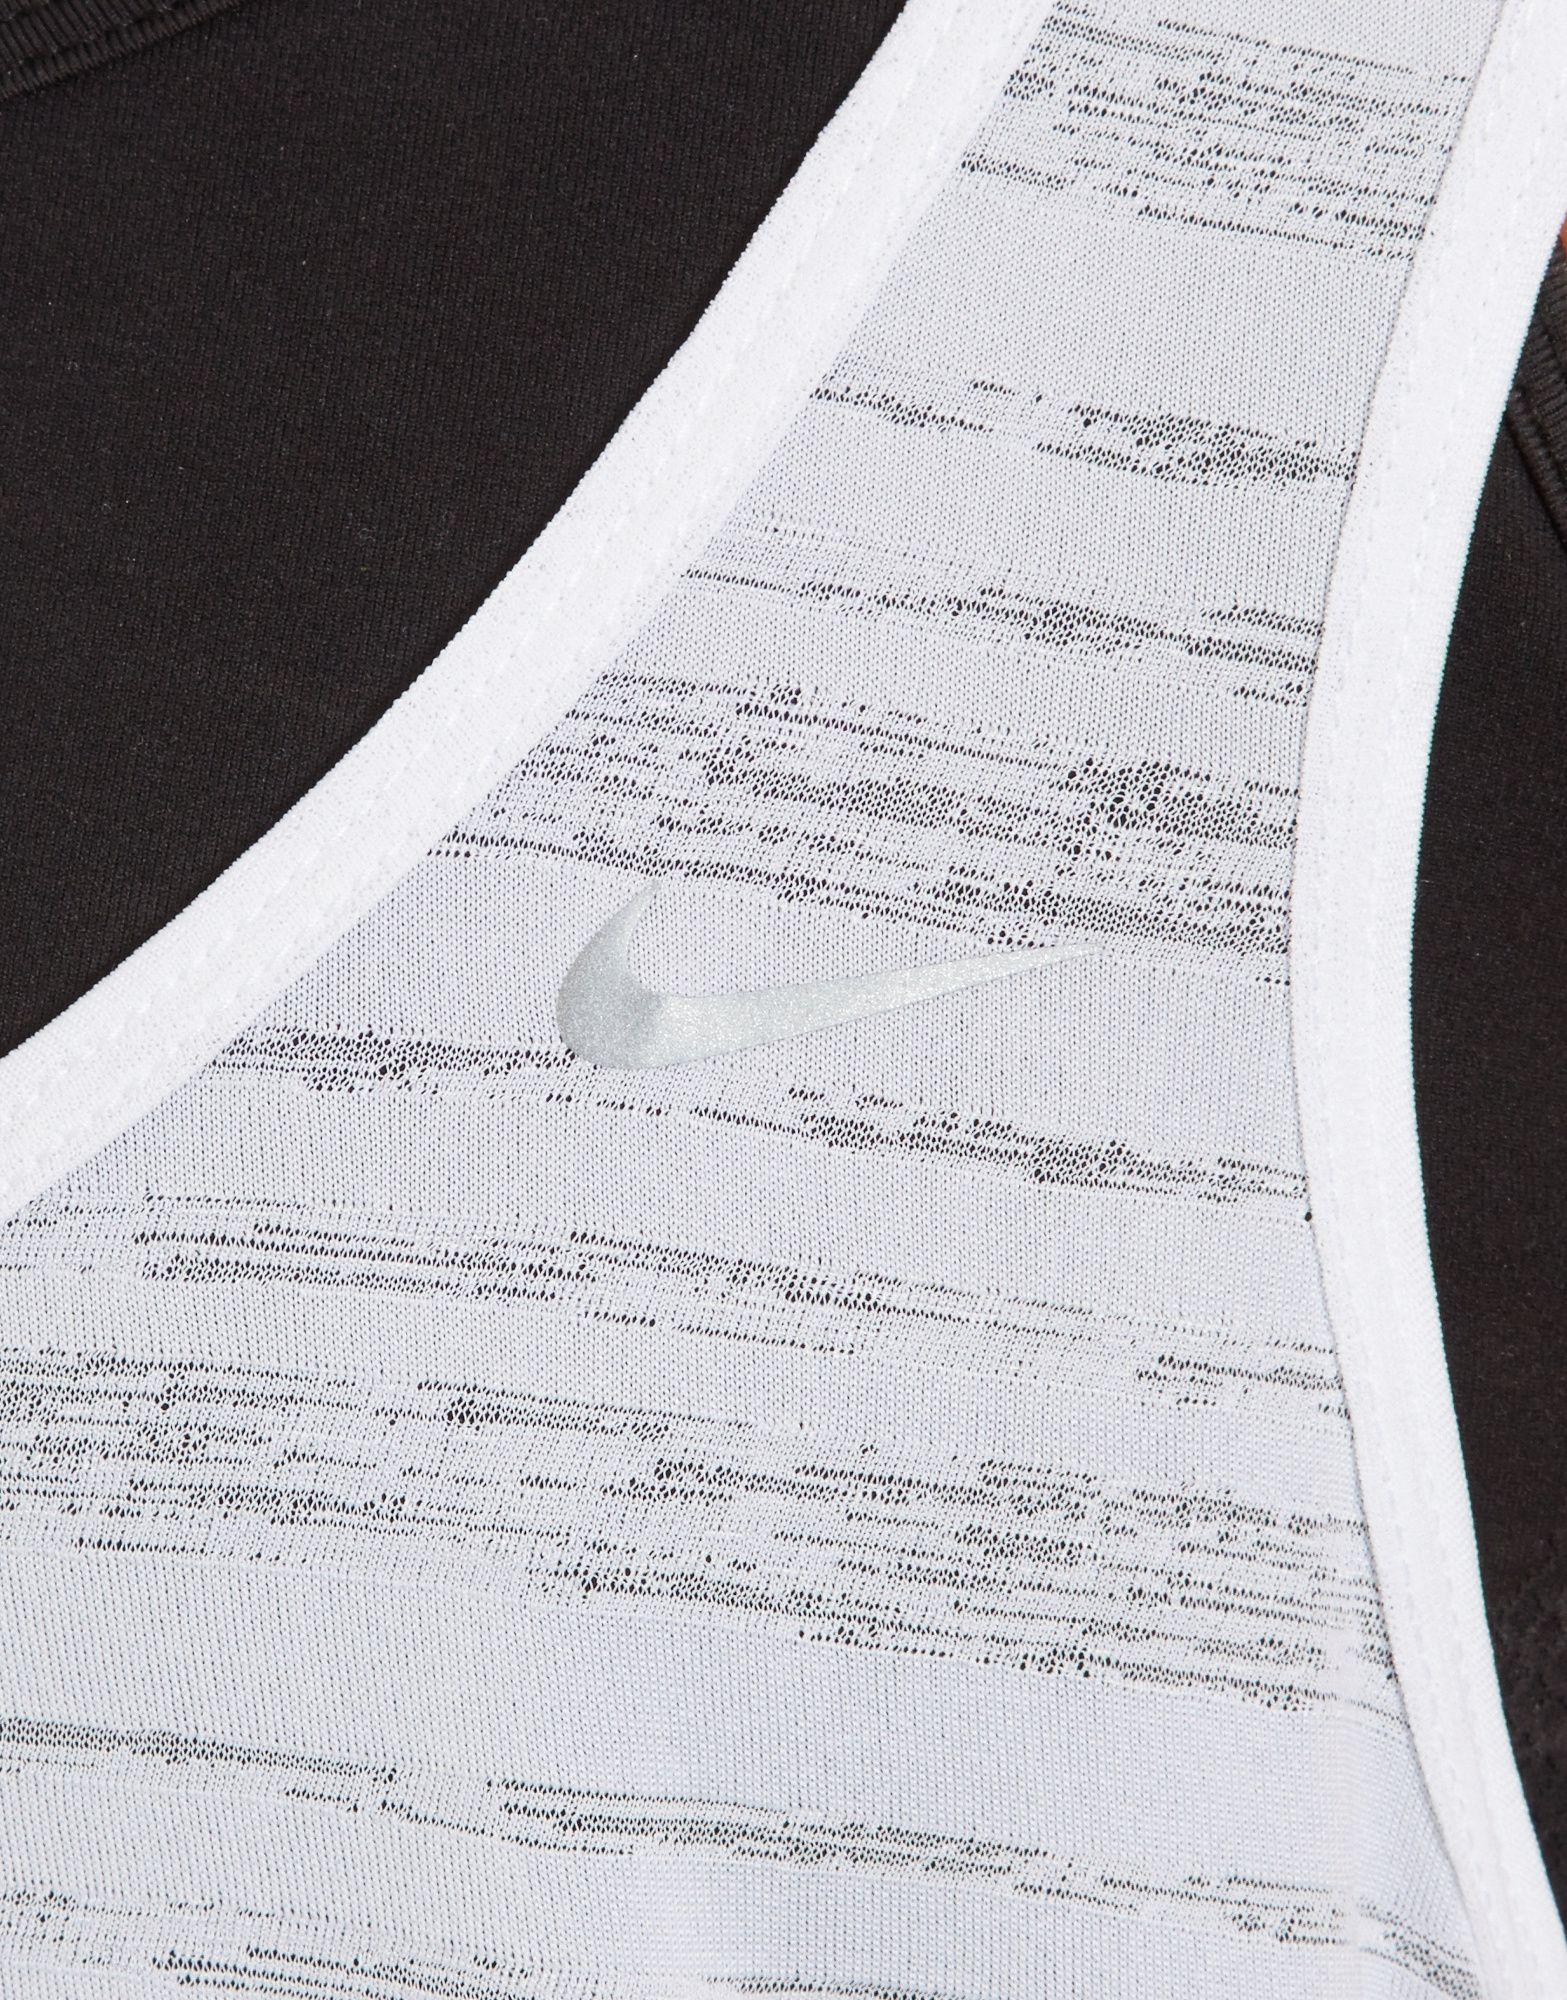 Nike Dri-FIT Touch Breeze Stripe Tank